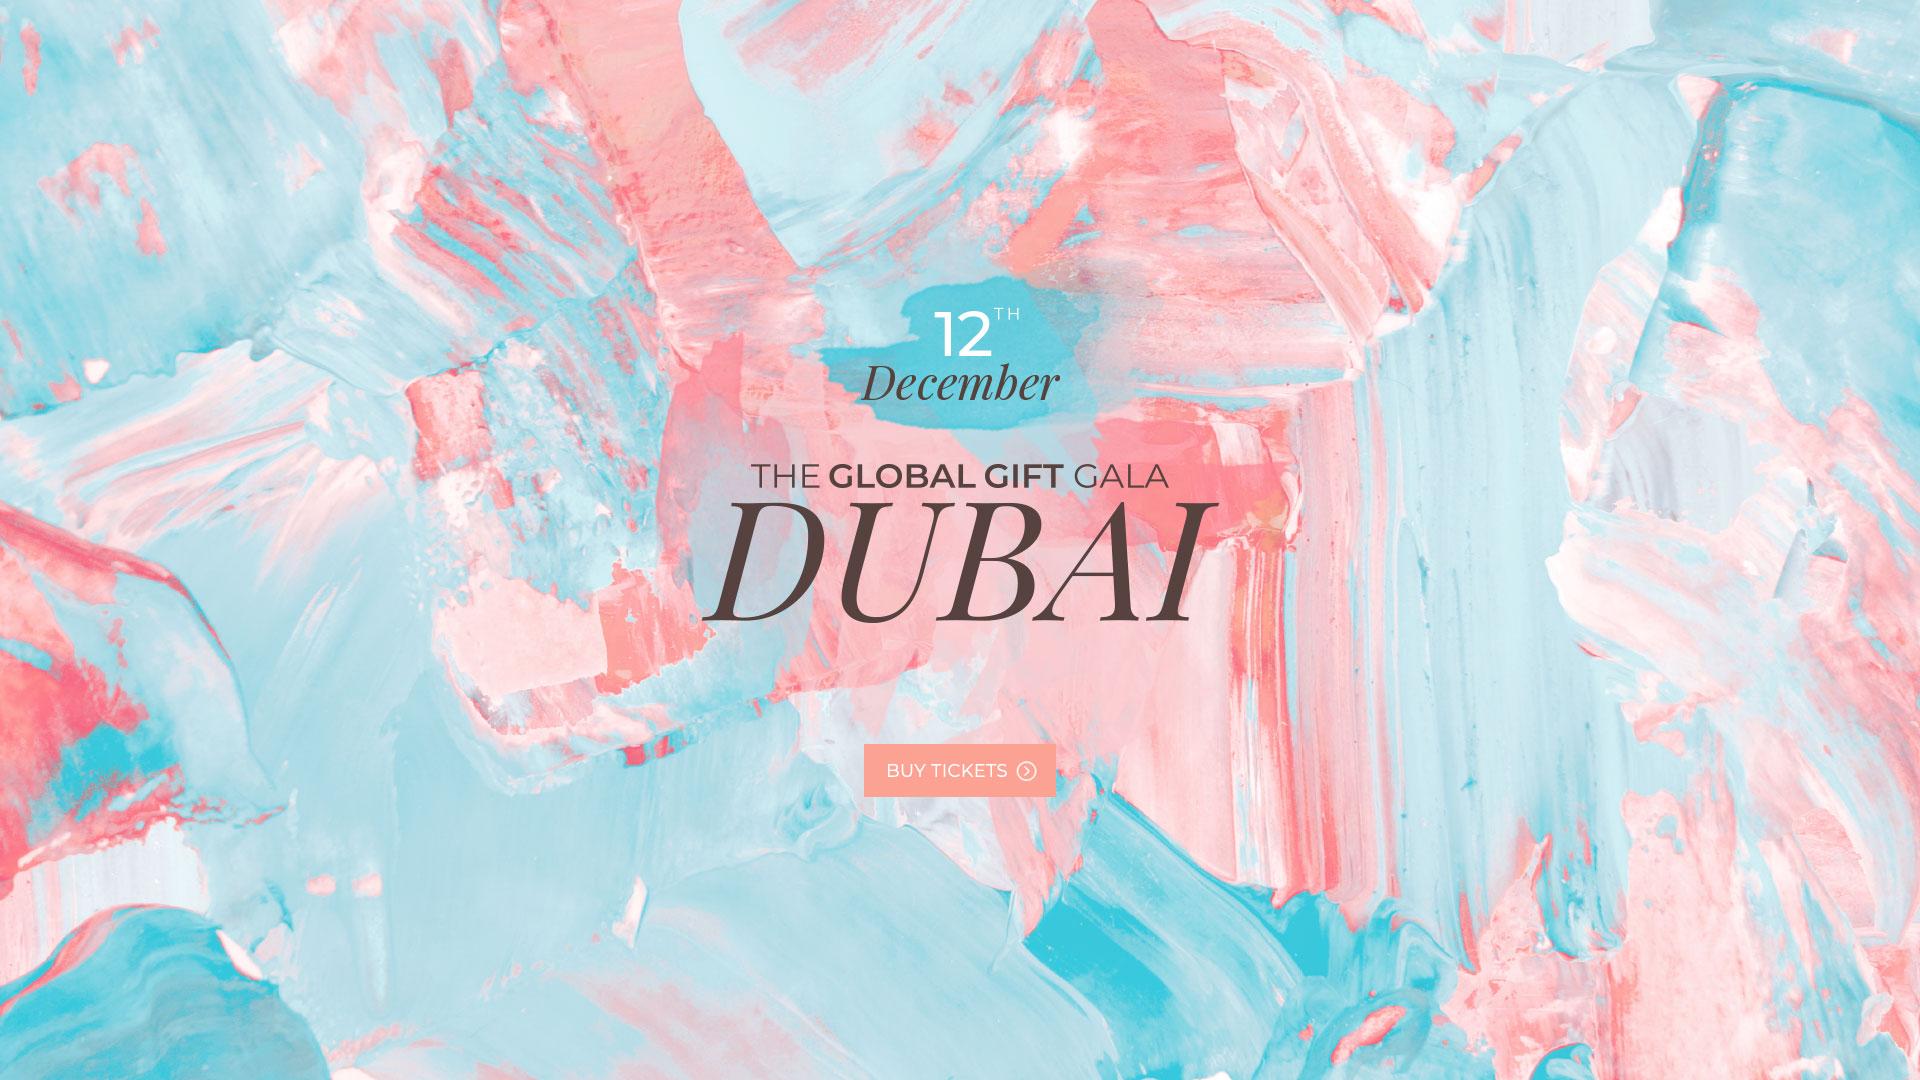 The Global Gift Gala Dubai 2019